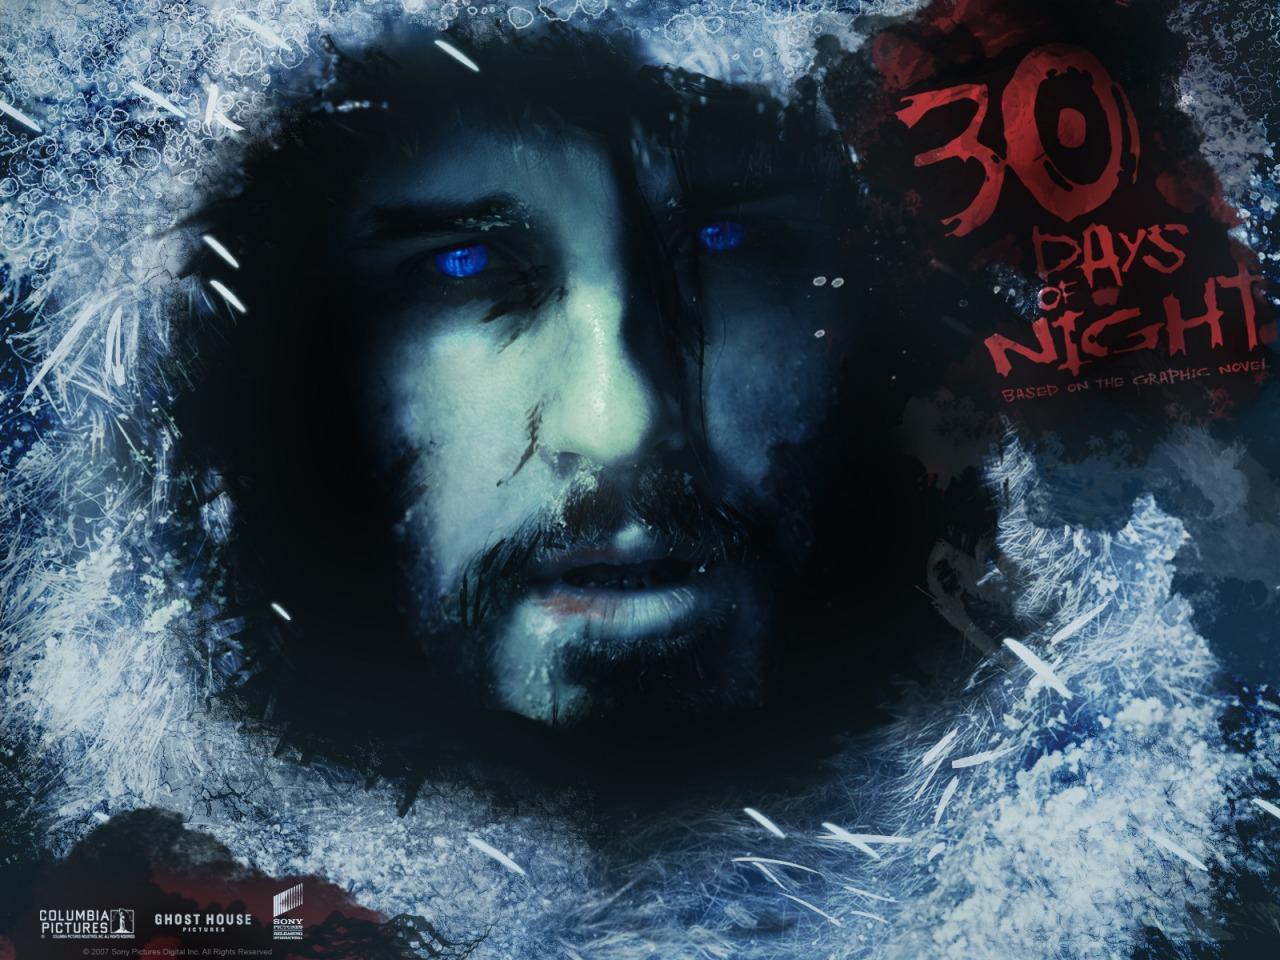 30 days of night full movie free download